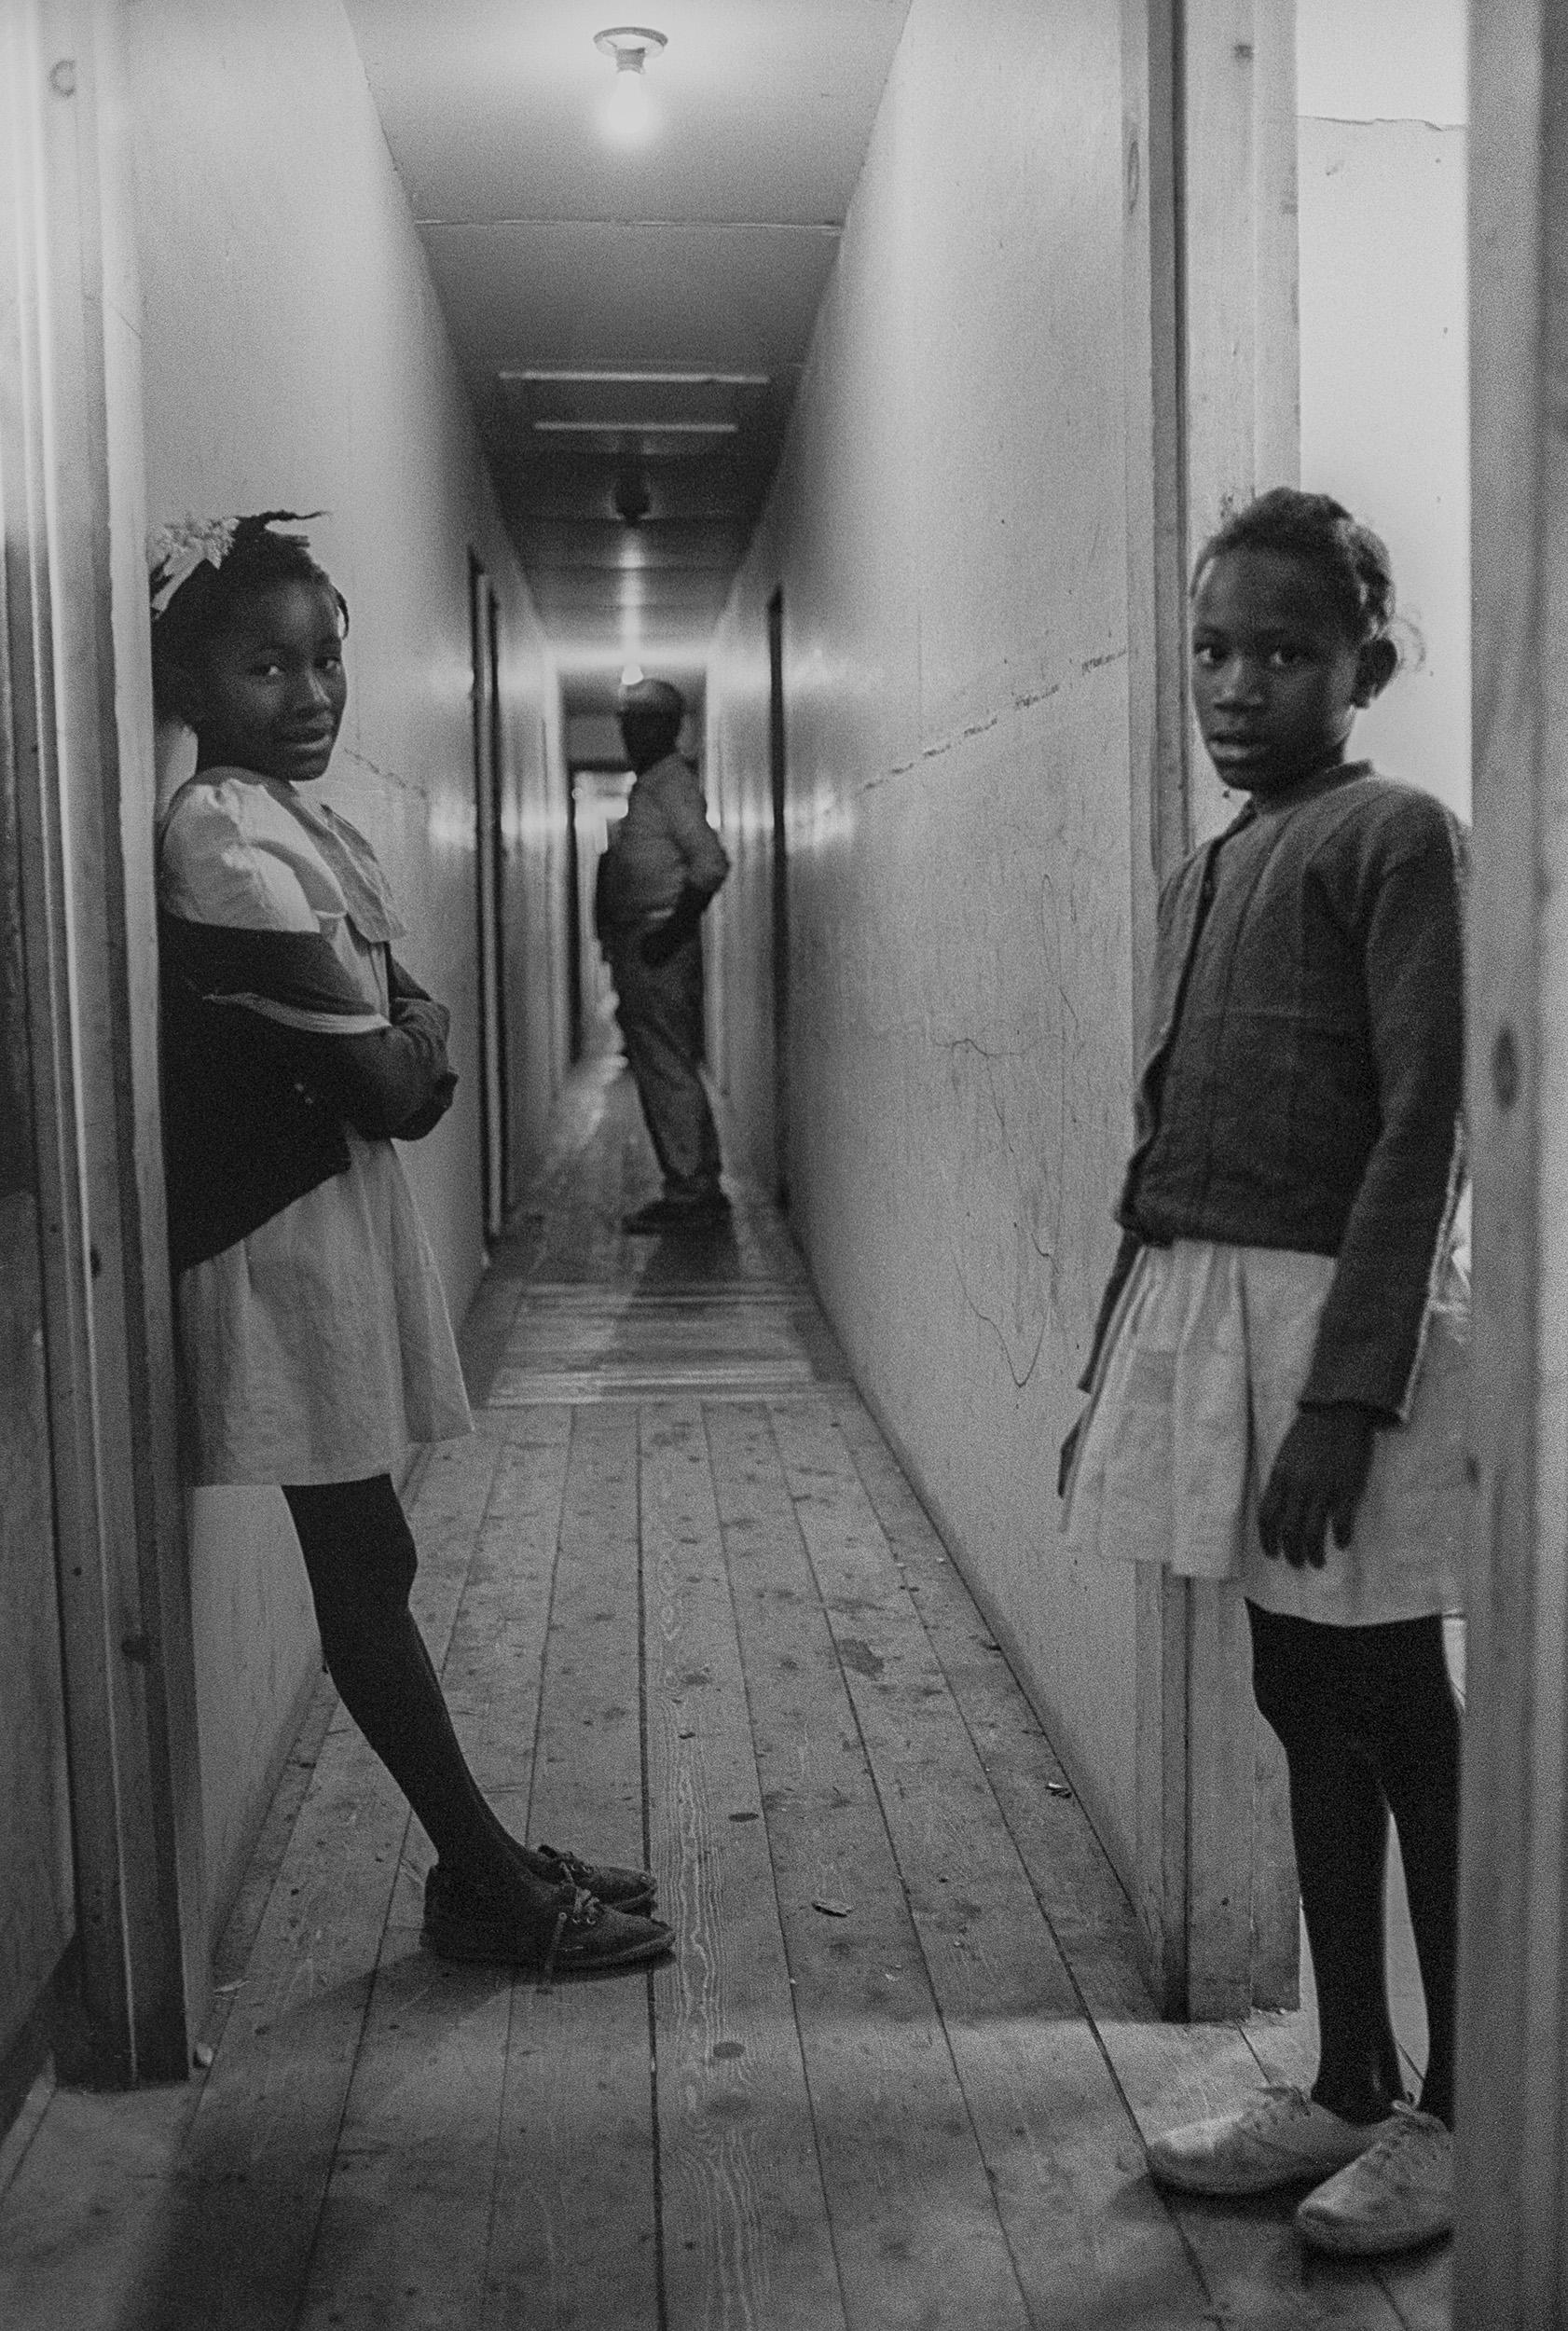 narrow hall 2 girls